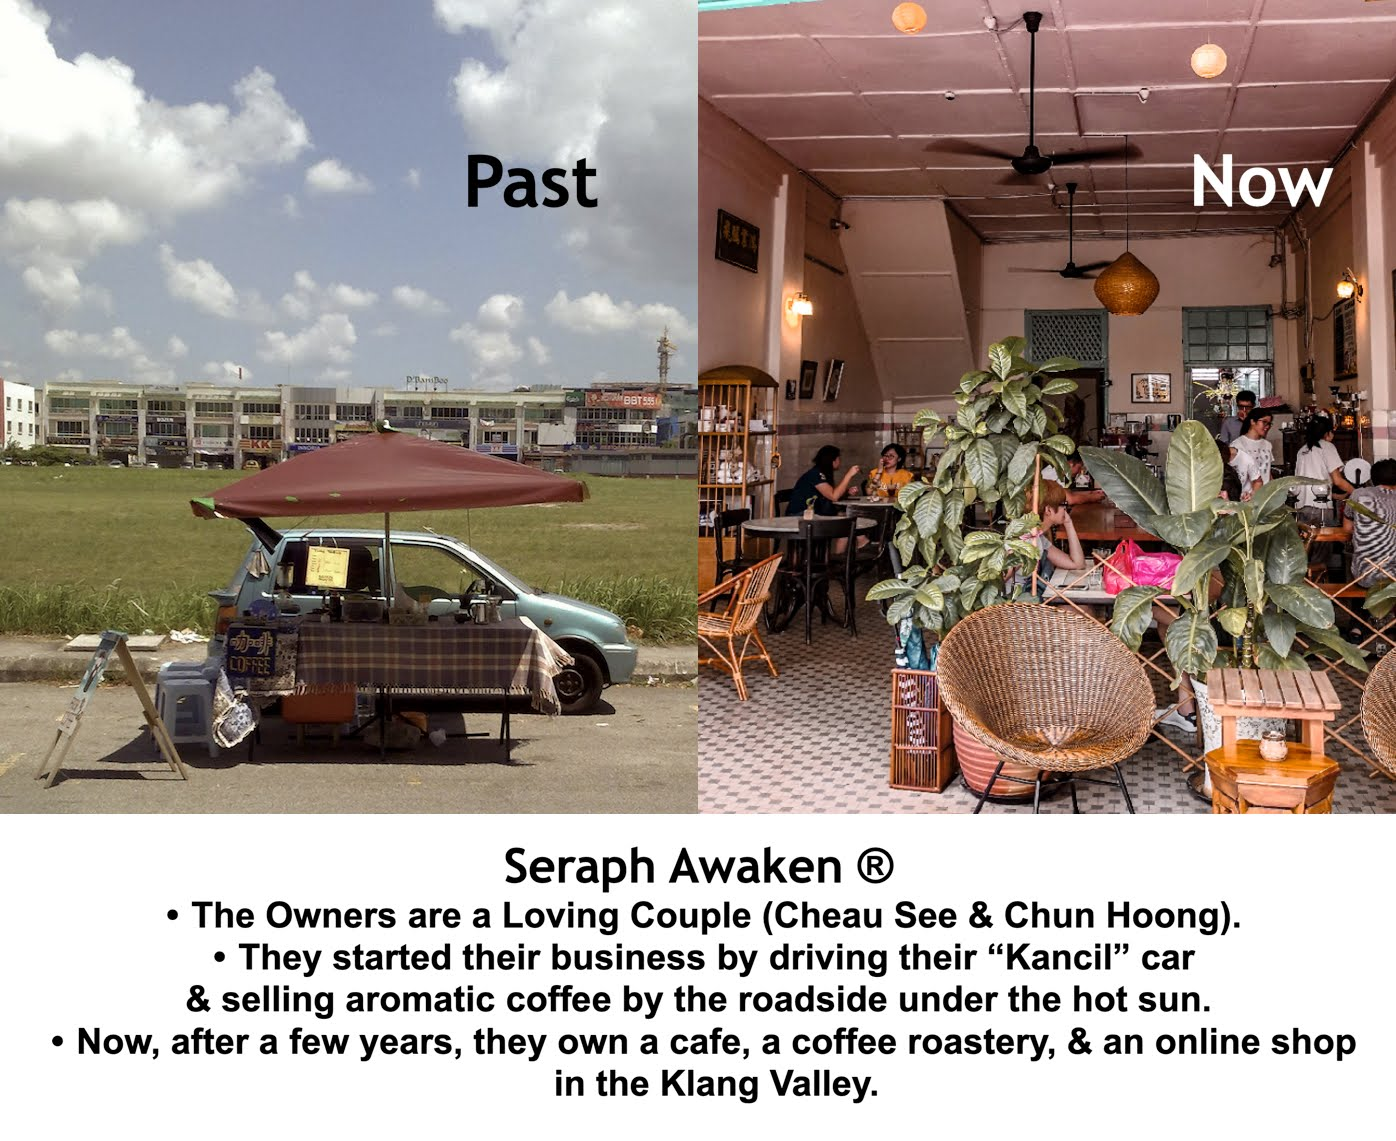 Seraph Awaken Trademark